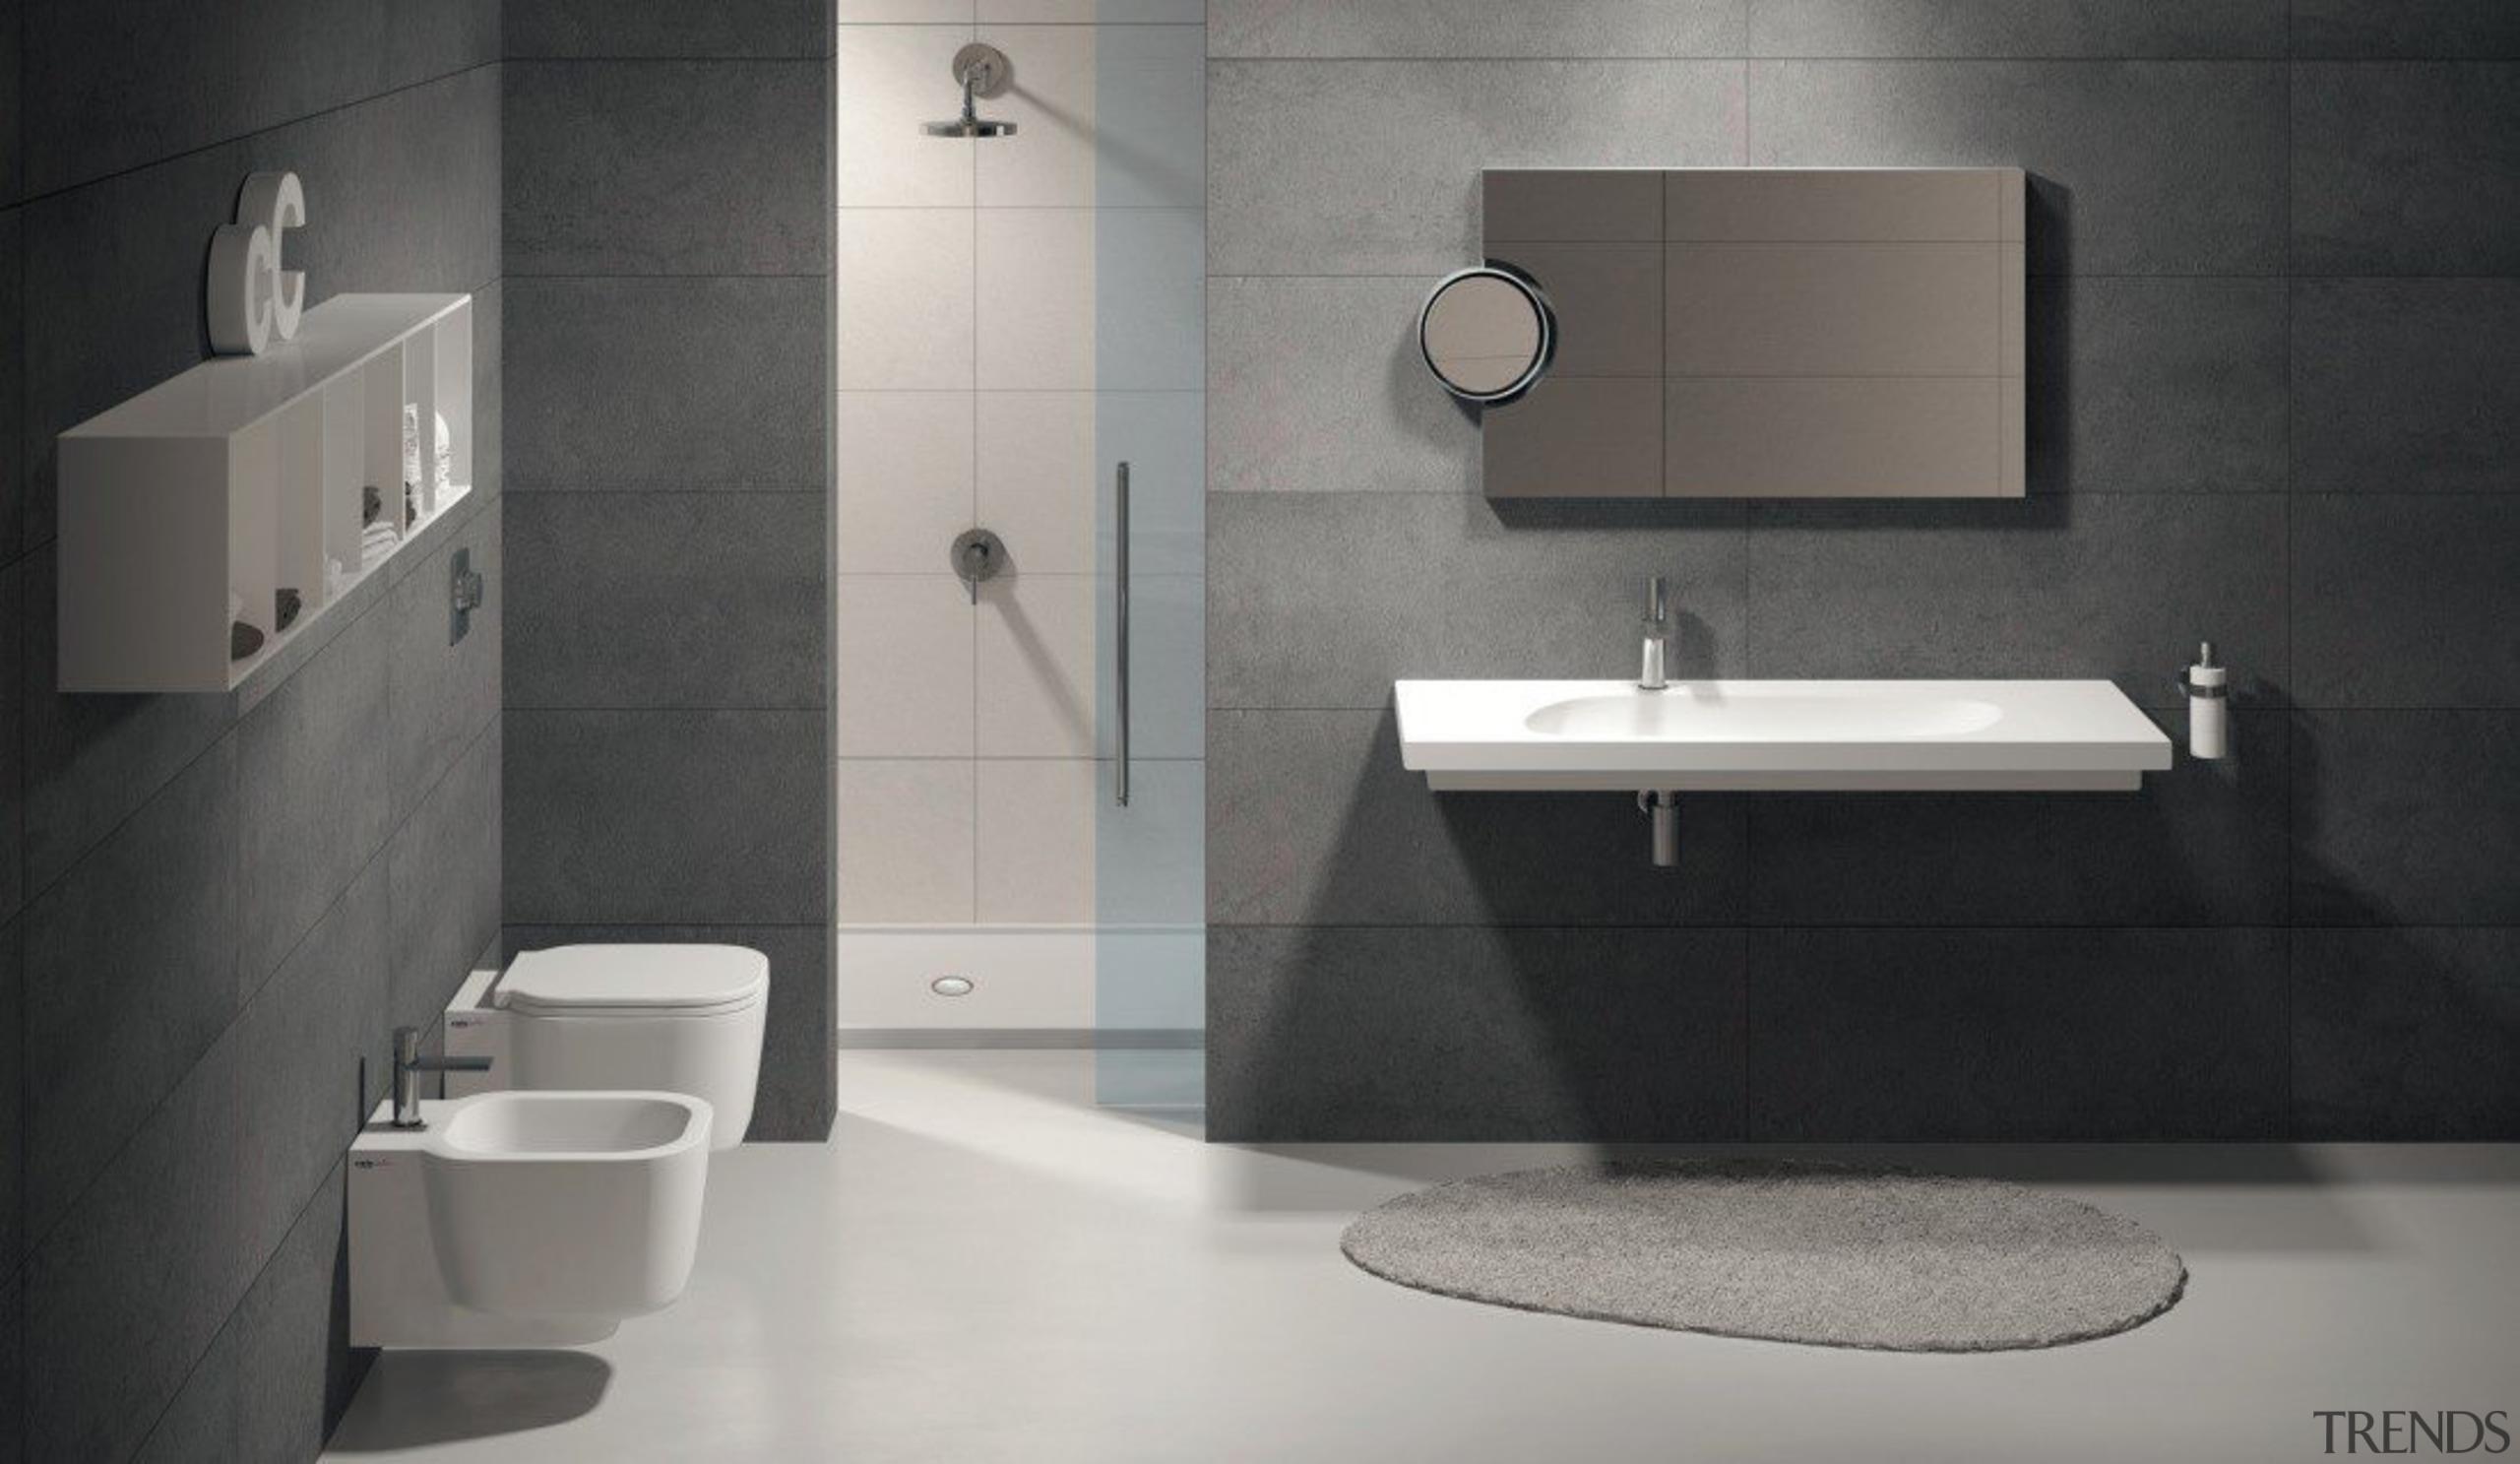 Cubika - angle | bathroom | bathroom accessory angle, bathroom, bathroom accessory, bathroom cabinet, bathroom sink, bidet, ceramic, floor, interior design, plumbing fixture, product design, room, sink, tap, tile, toilet, wall, gray, black